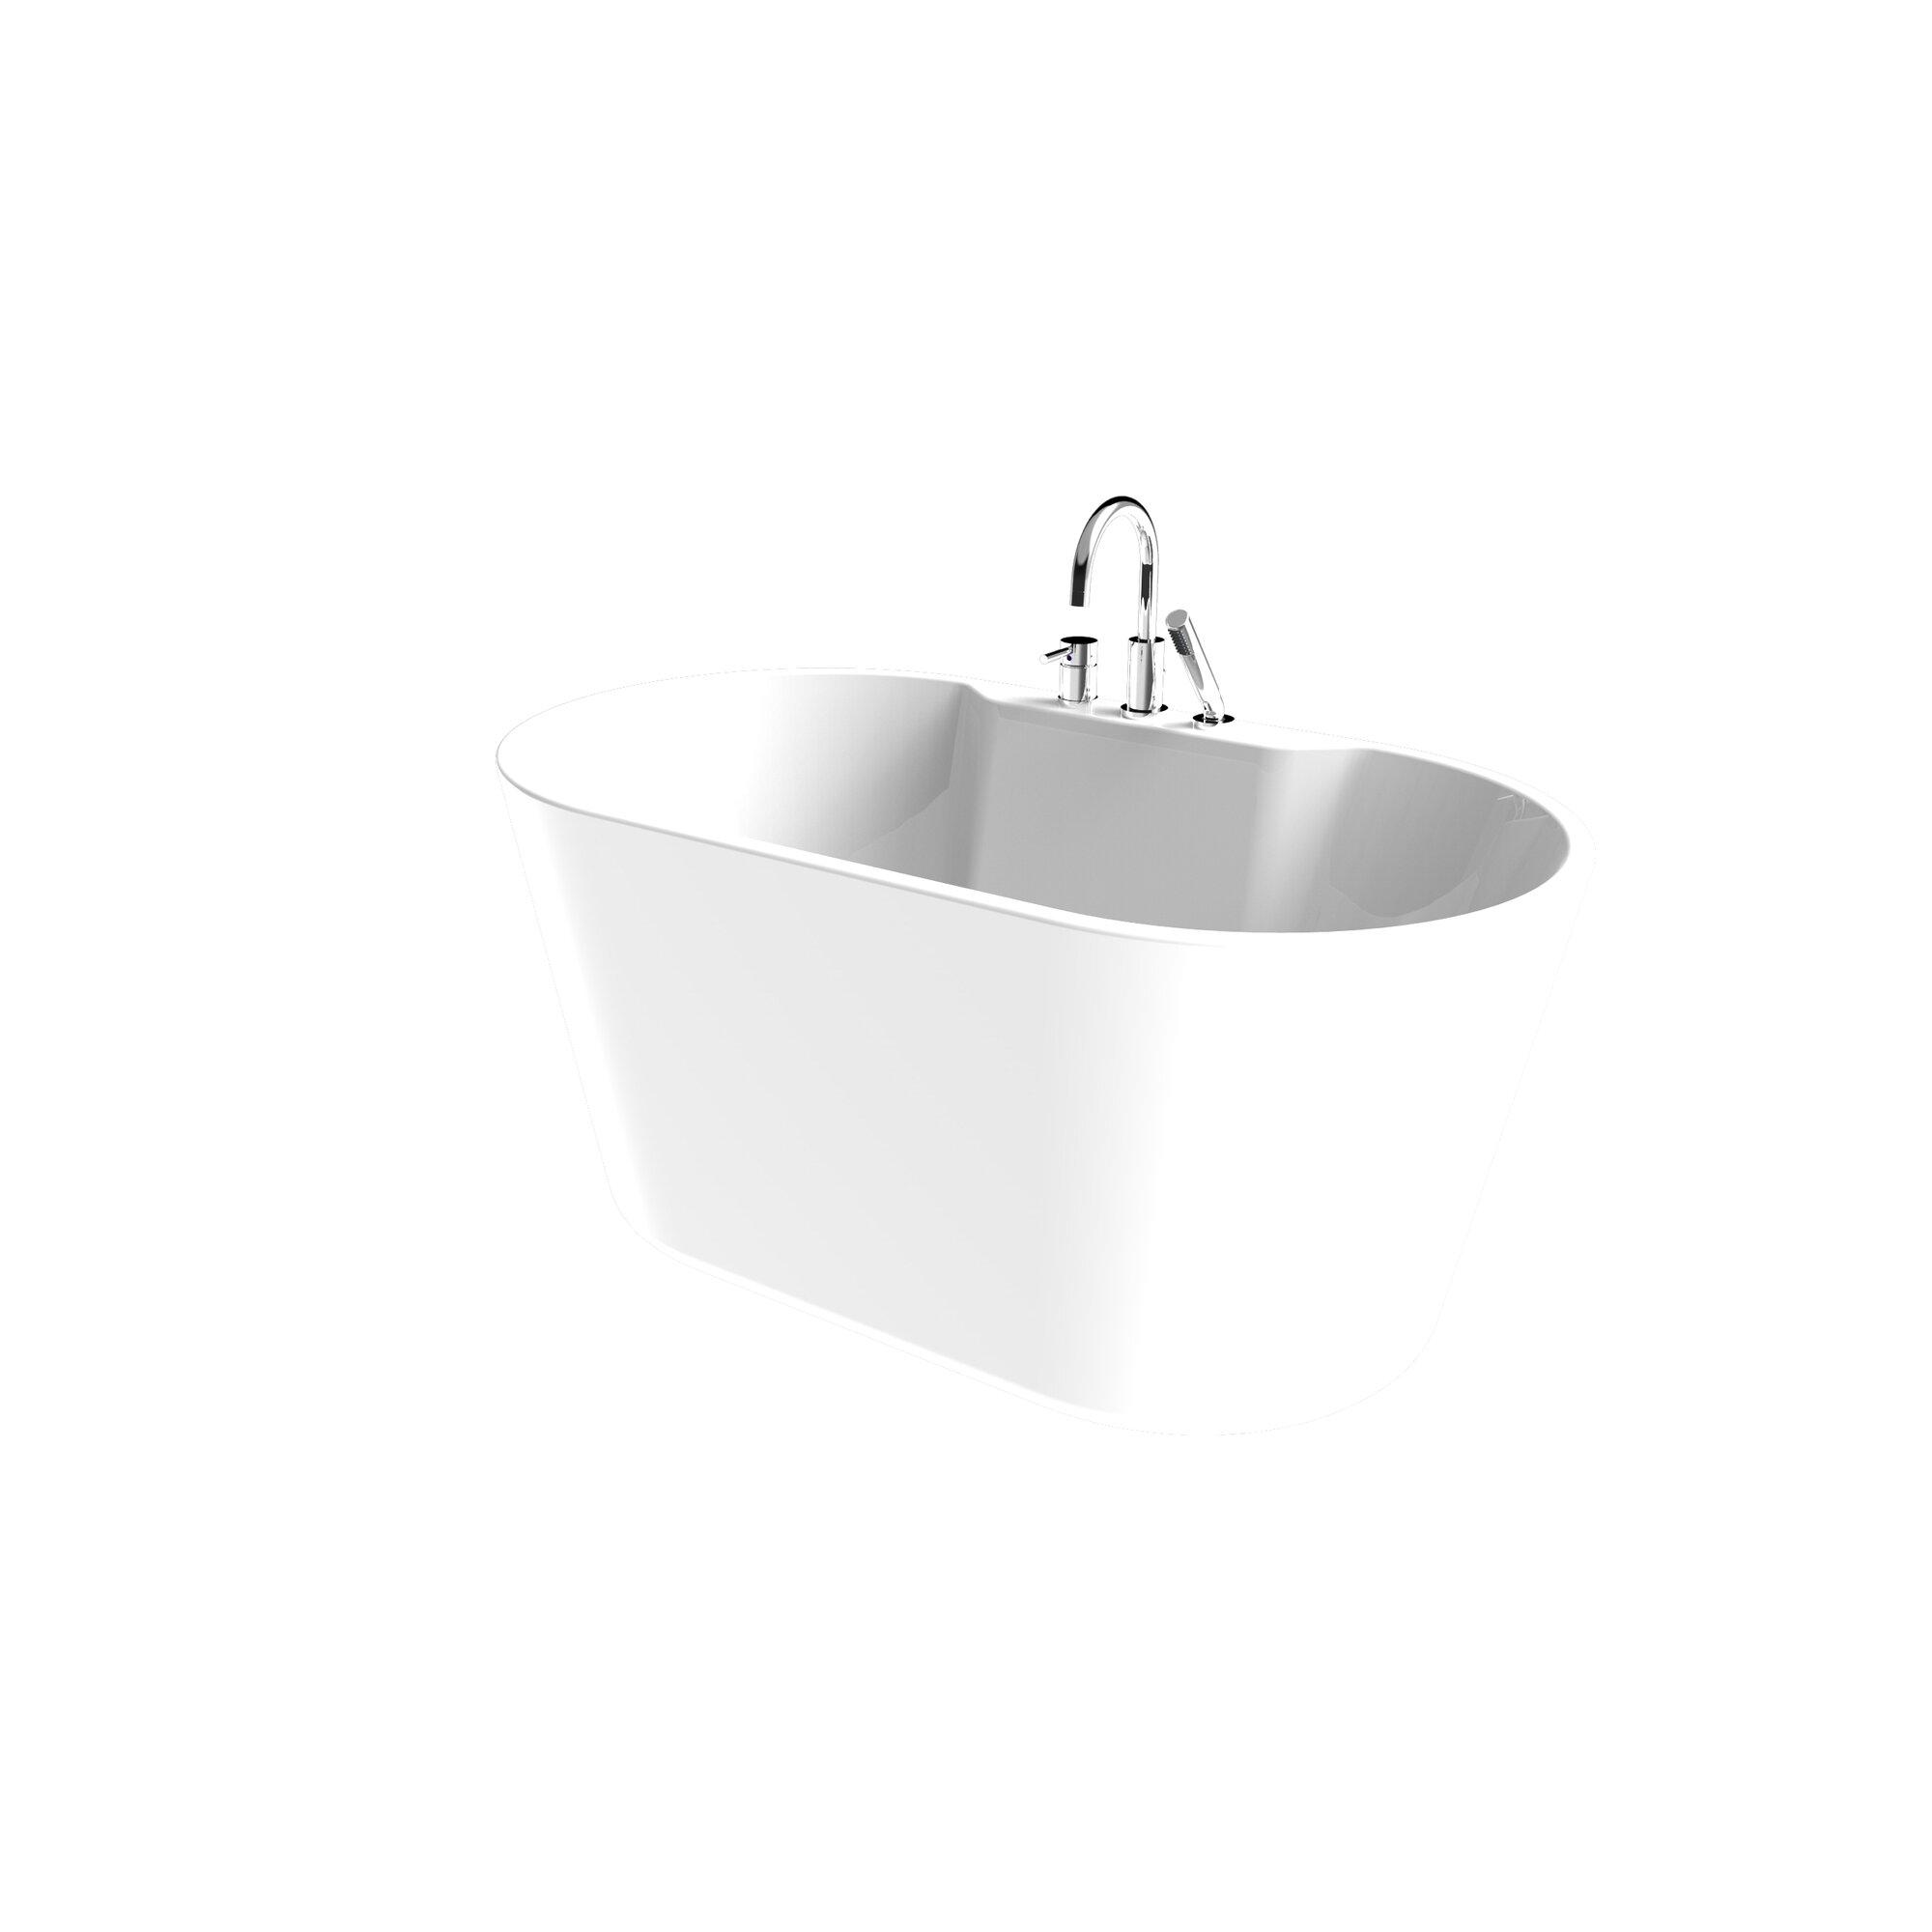 "A&E Bath And Shower 56"" X 31.5"" Bathtub & Reviews"